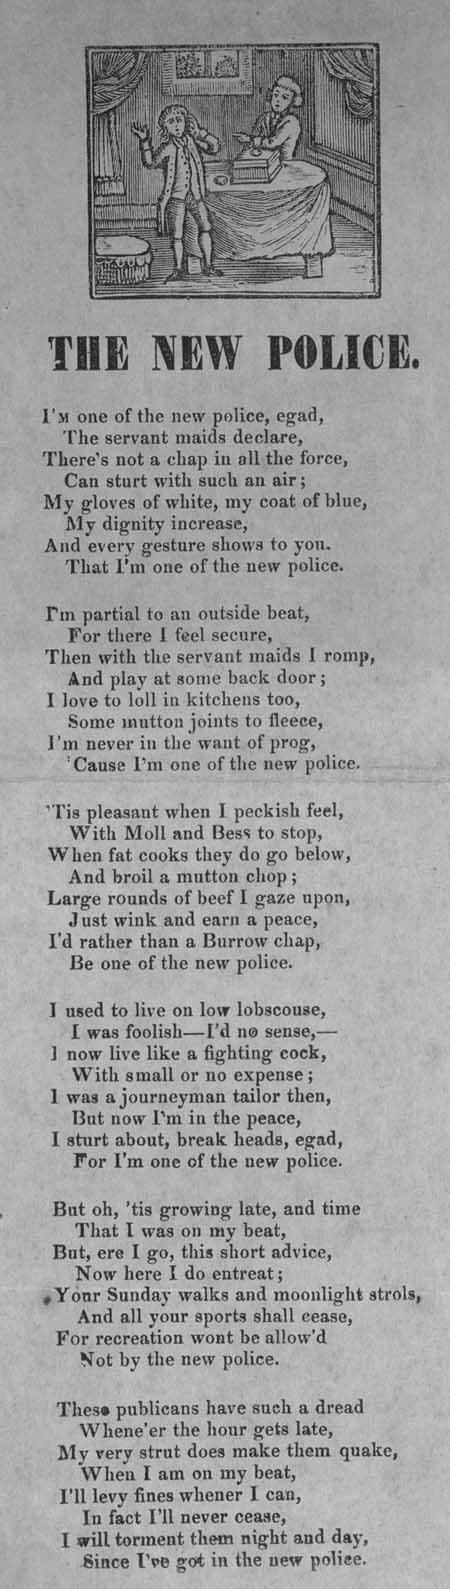 Broadside ballad entitled 'The New Police'